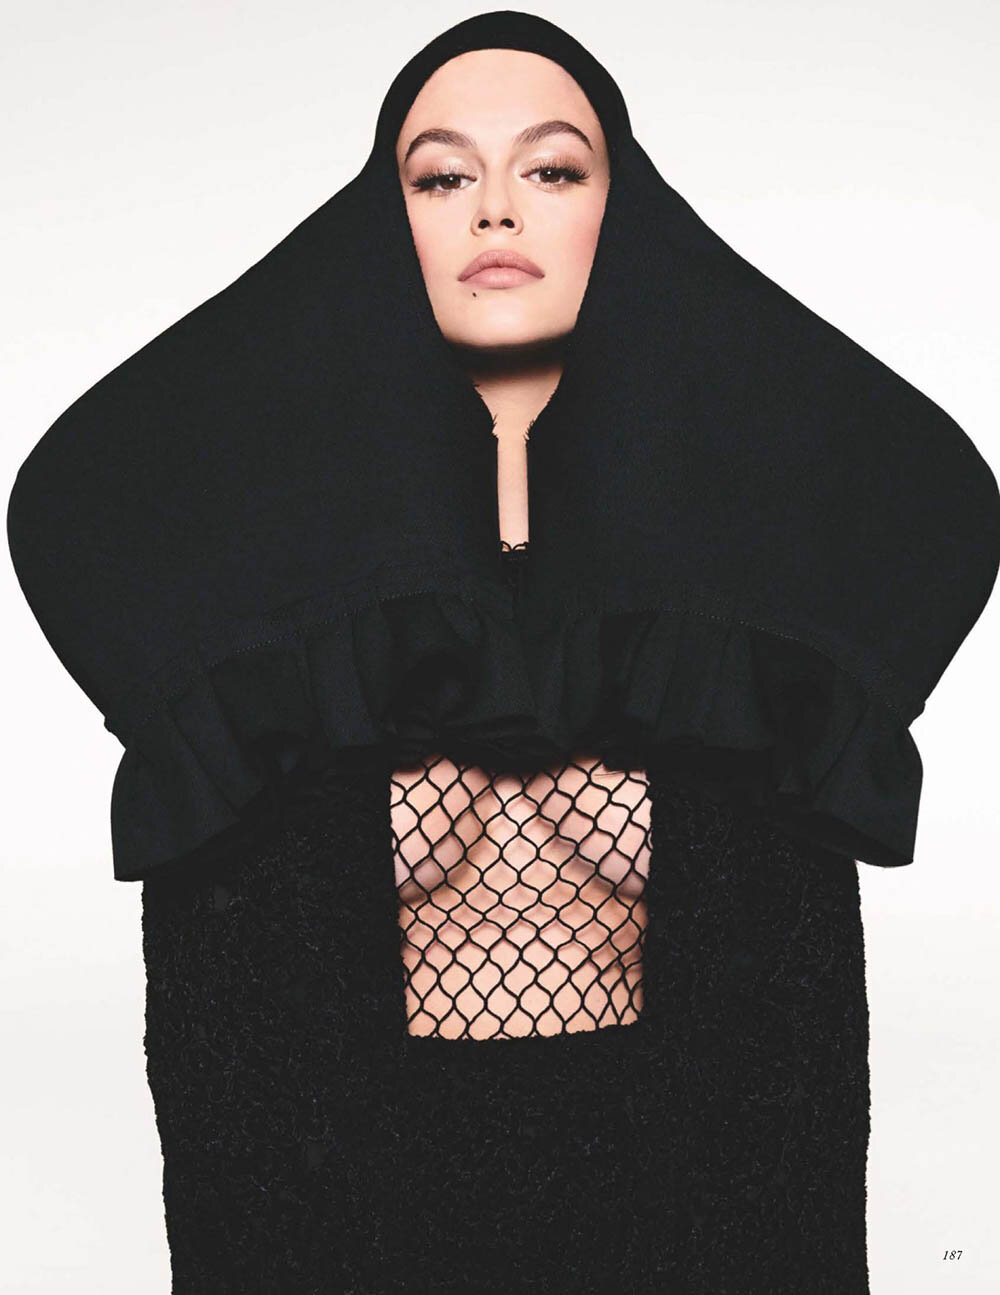 Kaia-Gerber-covers-British-Vogue-October-2019-by-Steven-Meisel-4.jpg